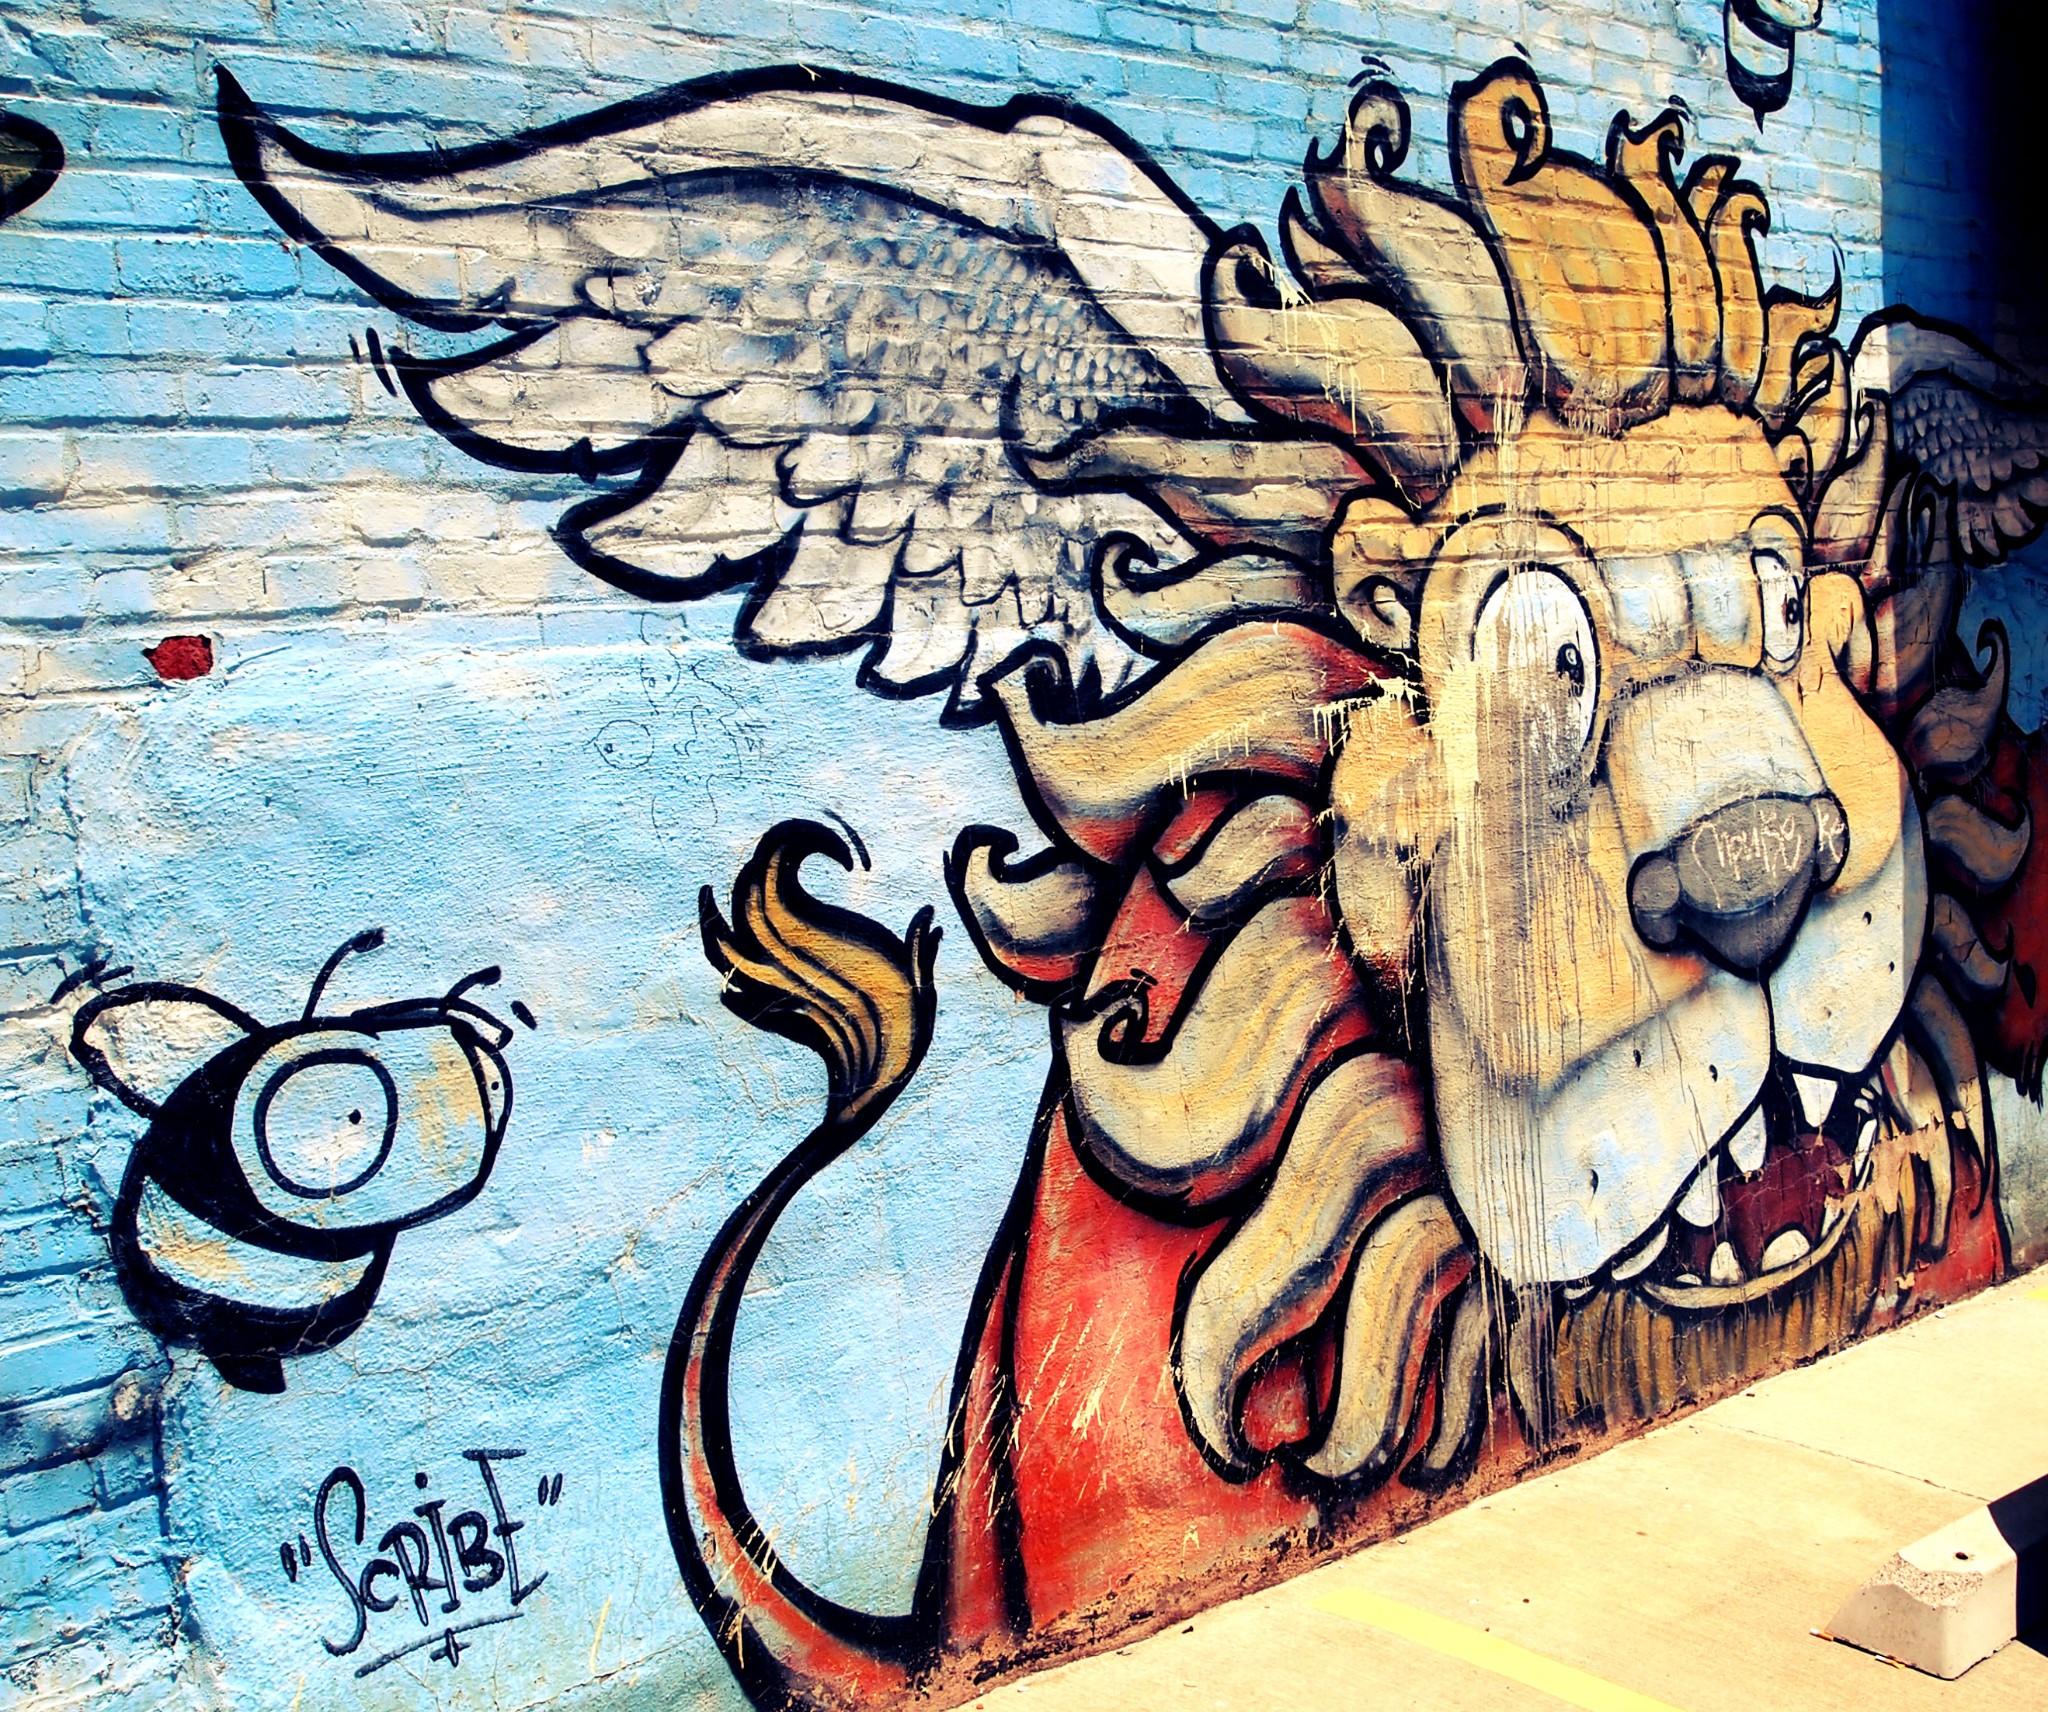 Scribe Mural Graffiti Kansas City